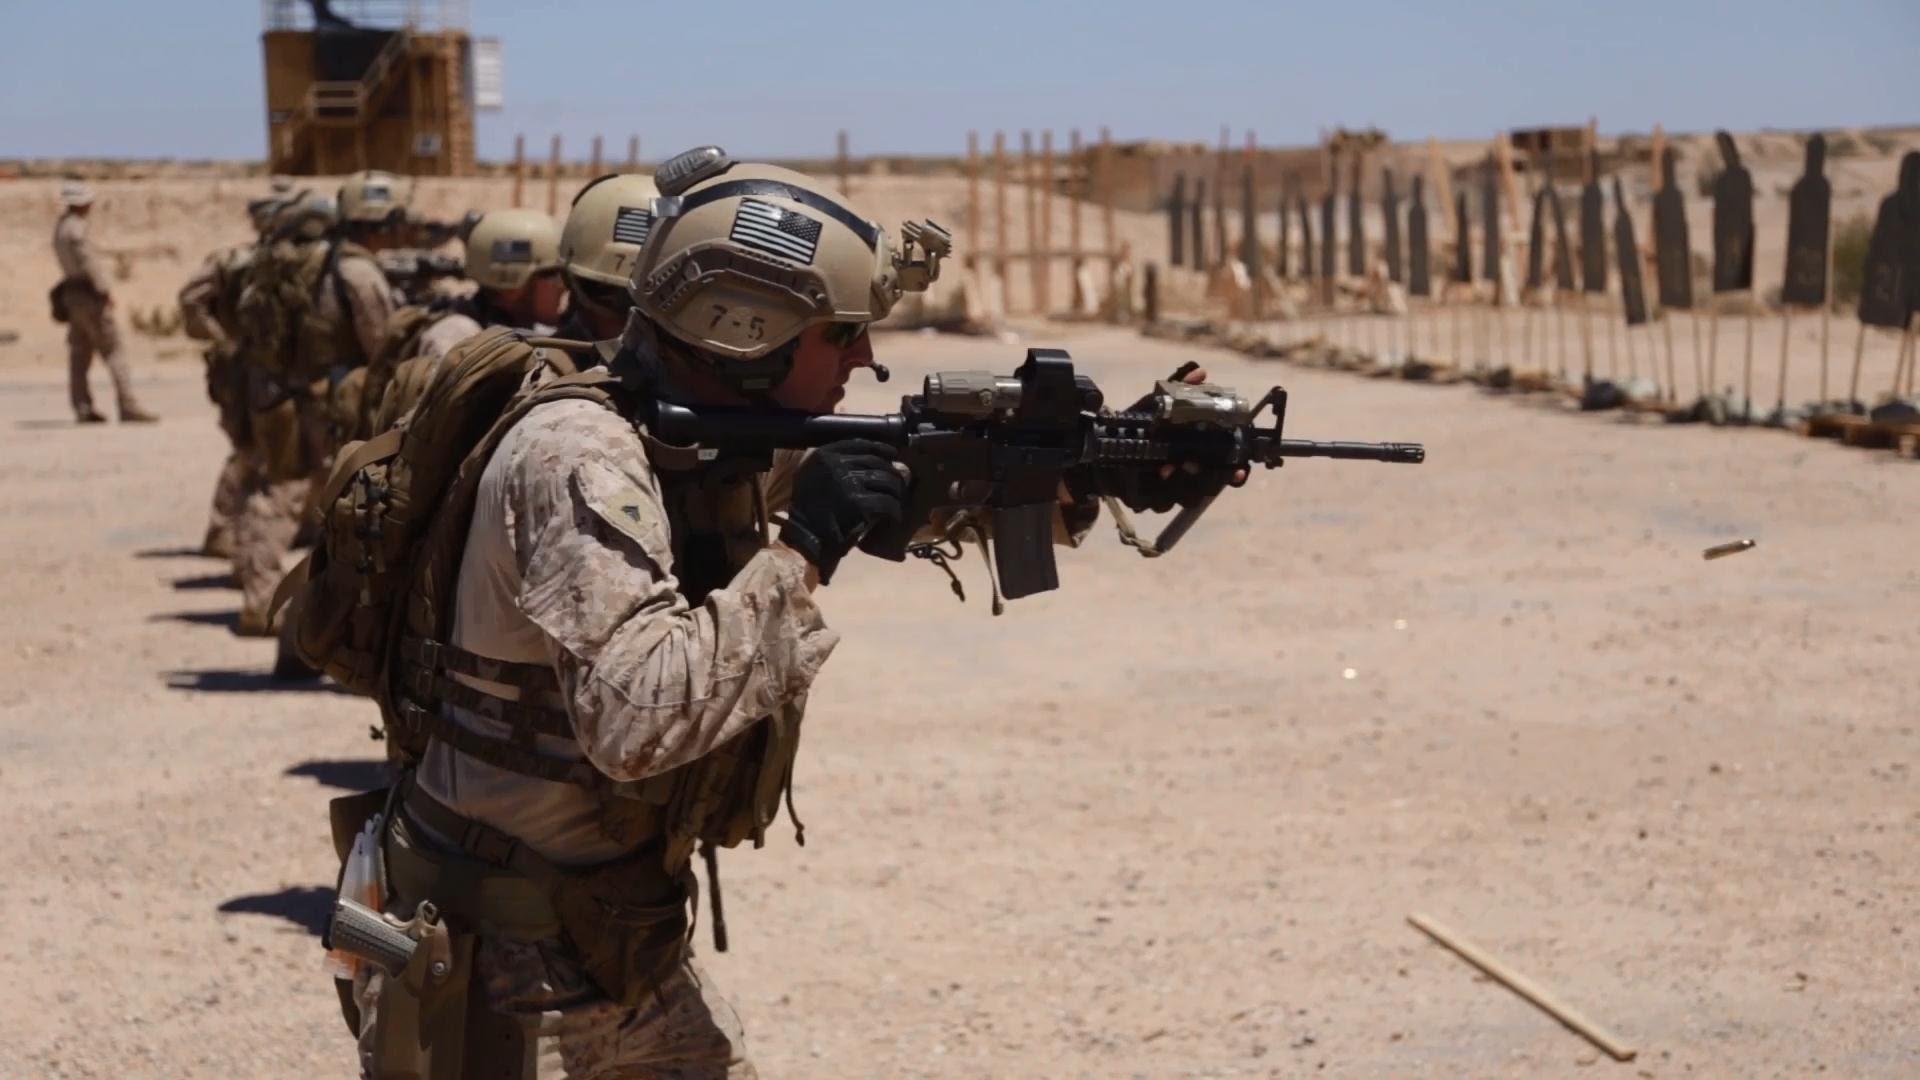 US Marines Combat Marksmanship Skills – Live Fire & Shotgun Range – YouTube